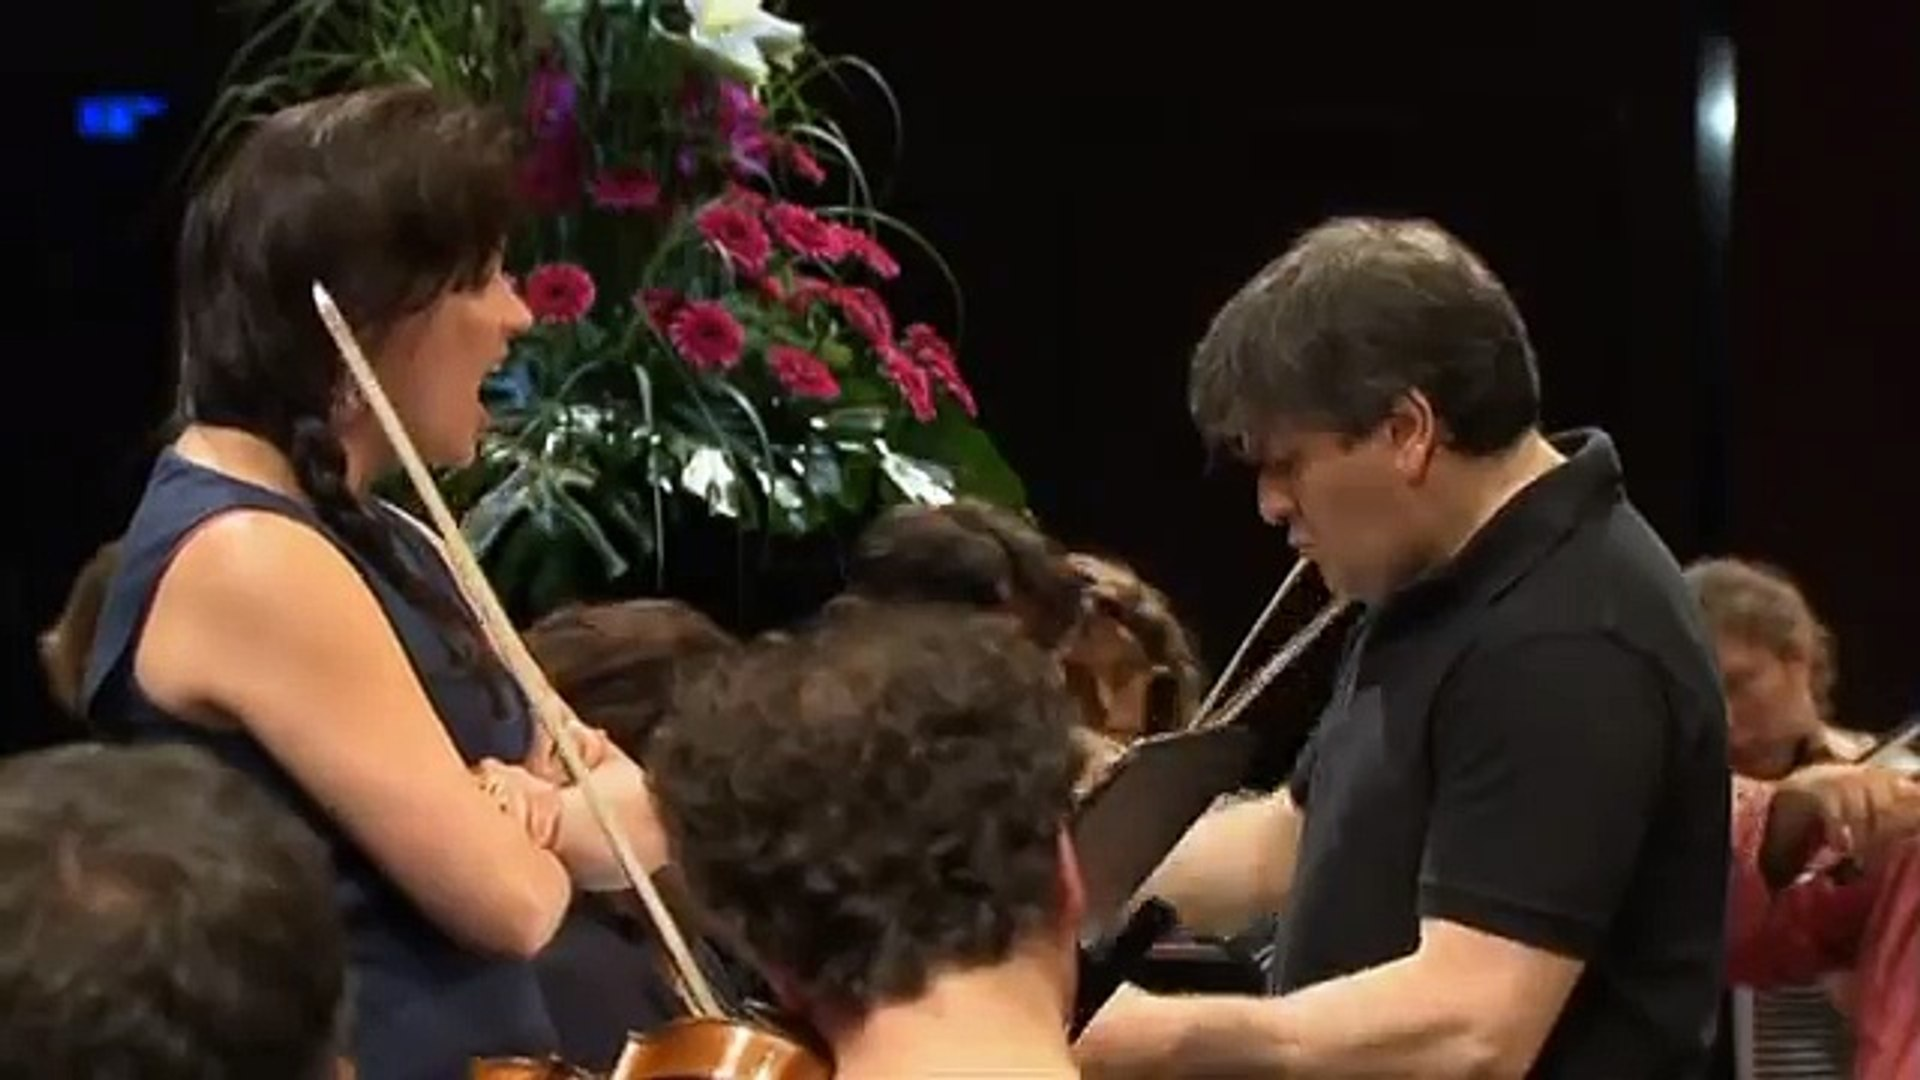 Anna Netrebko & Marianna Pizzolato - Stabat Mater - Pergolesi (Official Video)